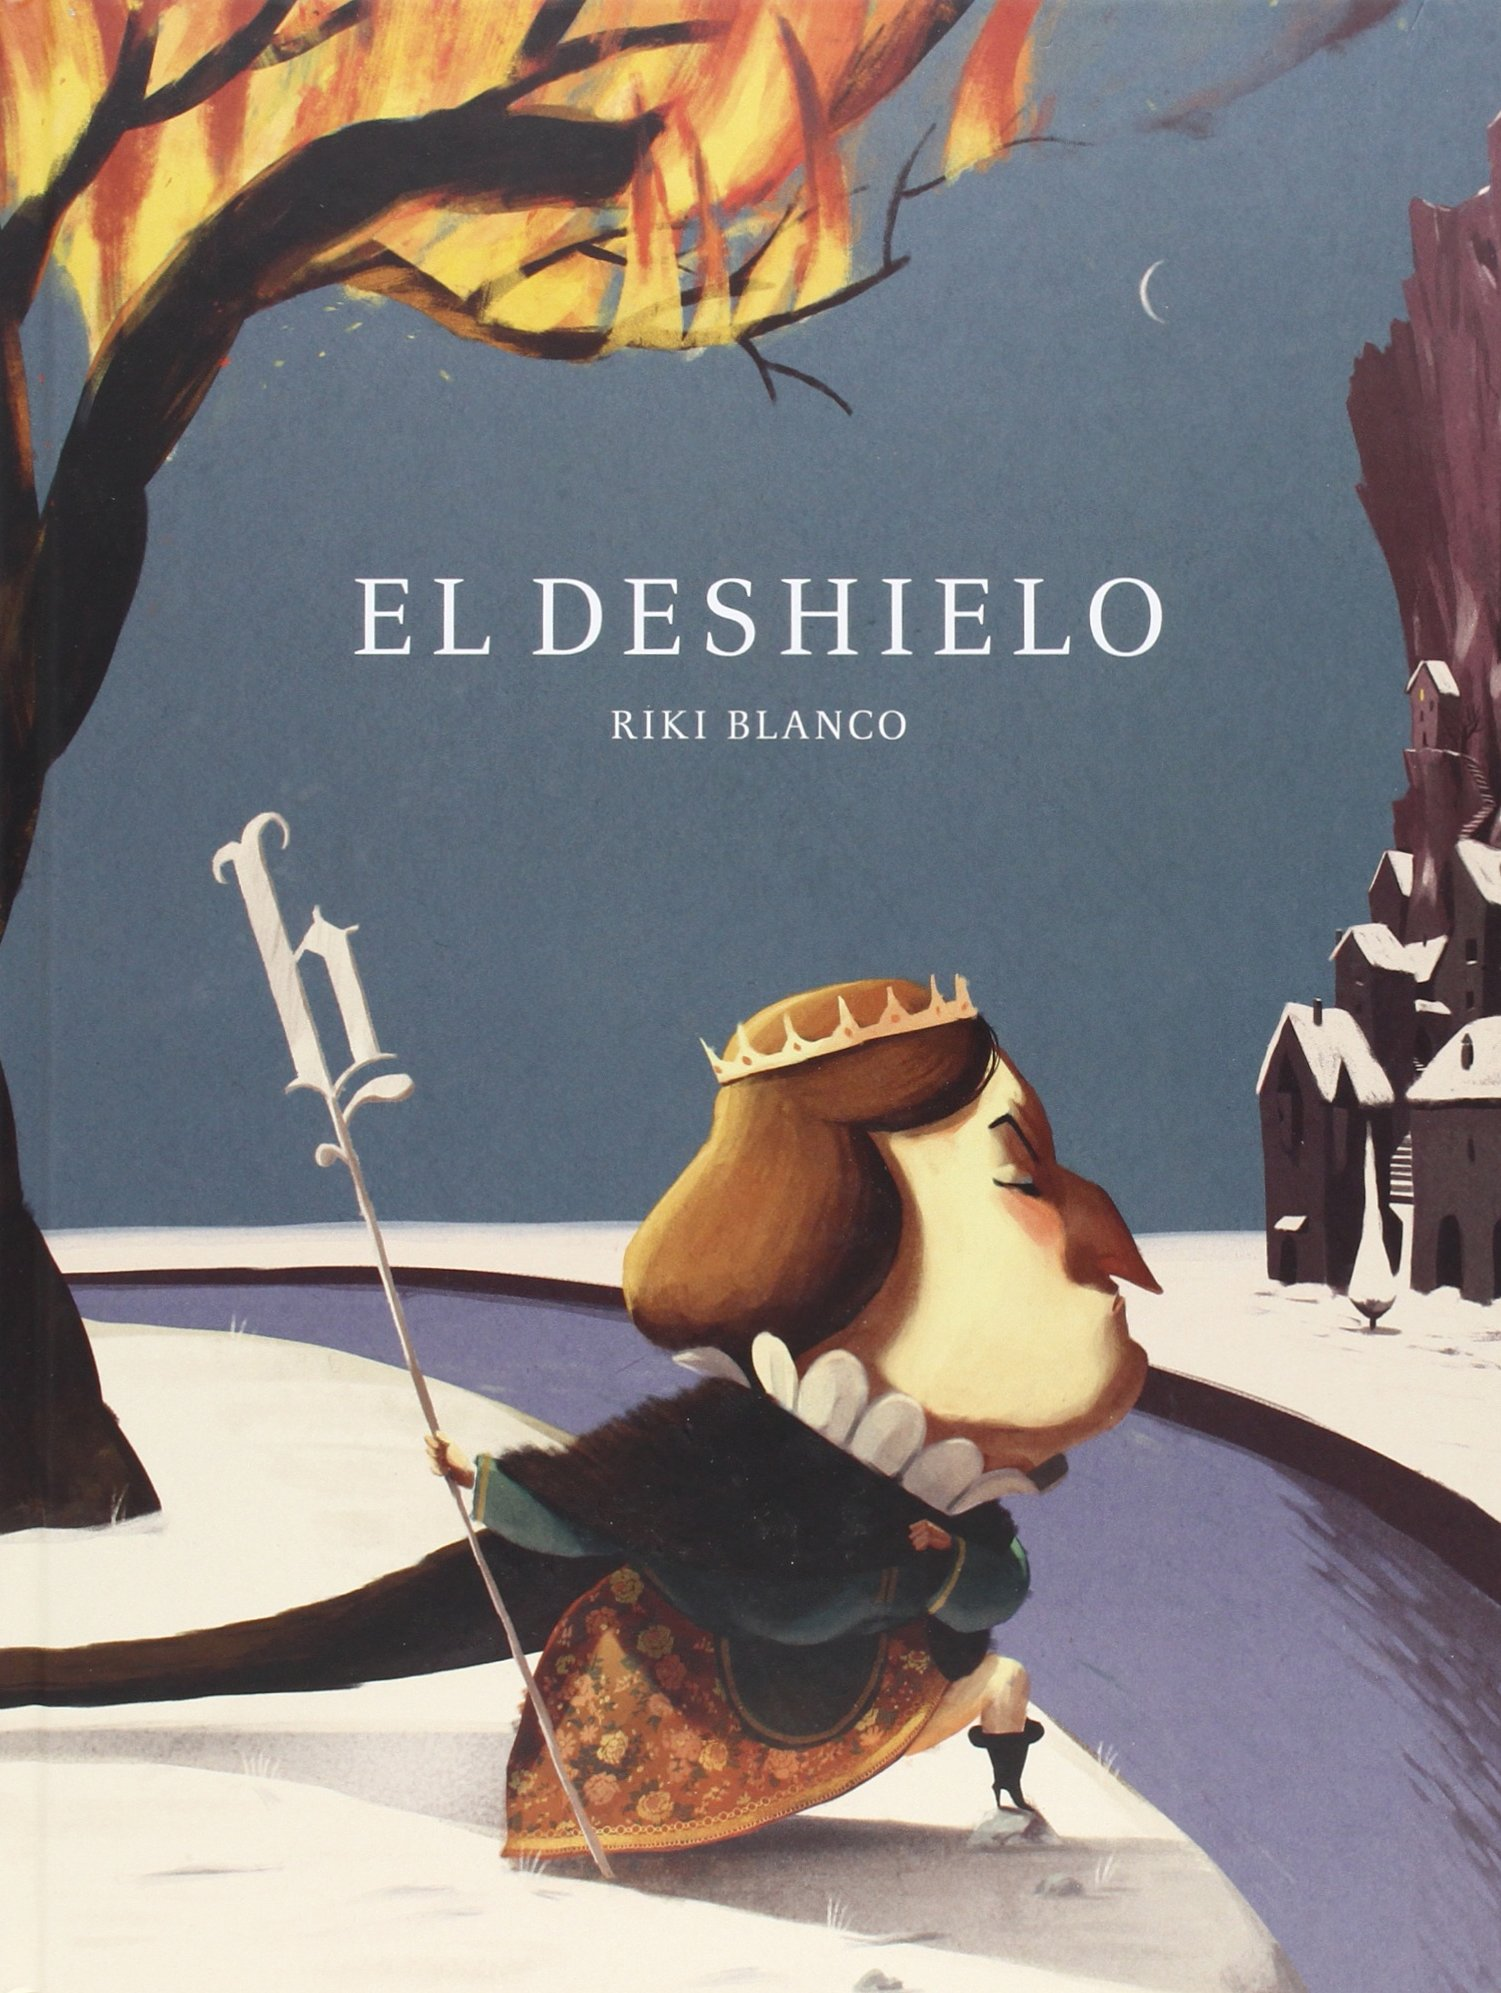 El Deshielo (ILUSTRADOS): Amazon.es: Blanco, Riki, Blanco, Riki: Libros